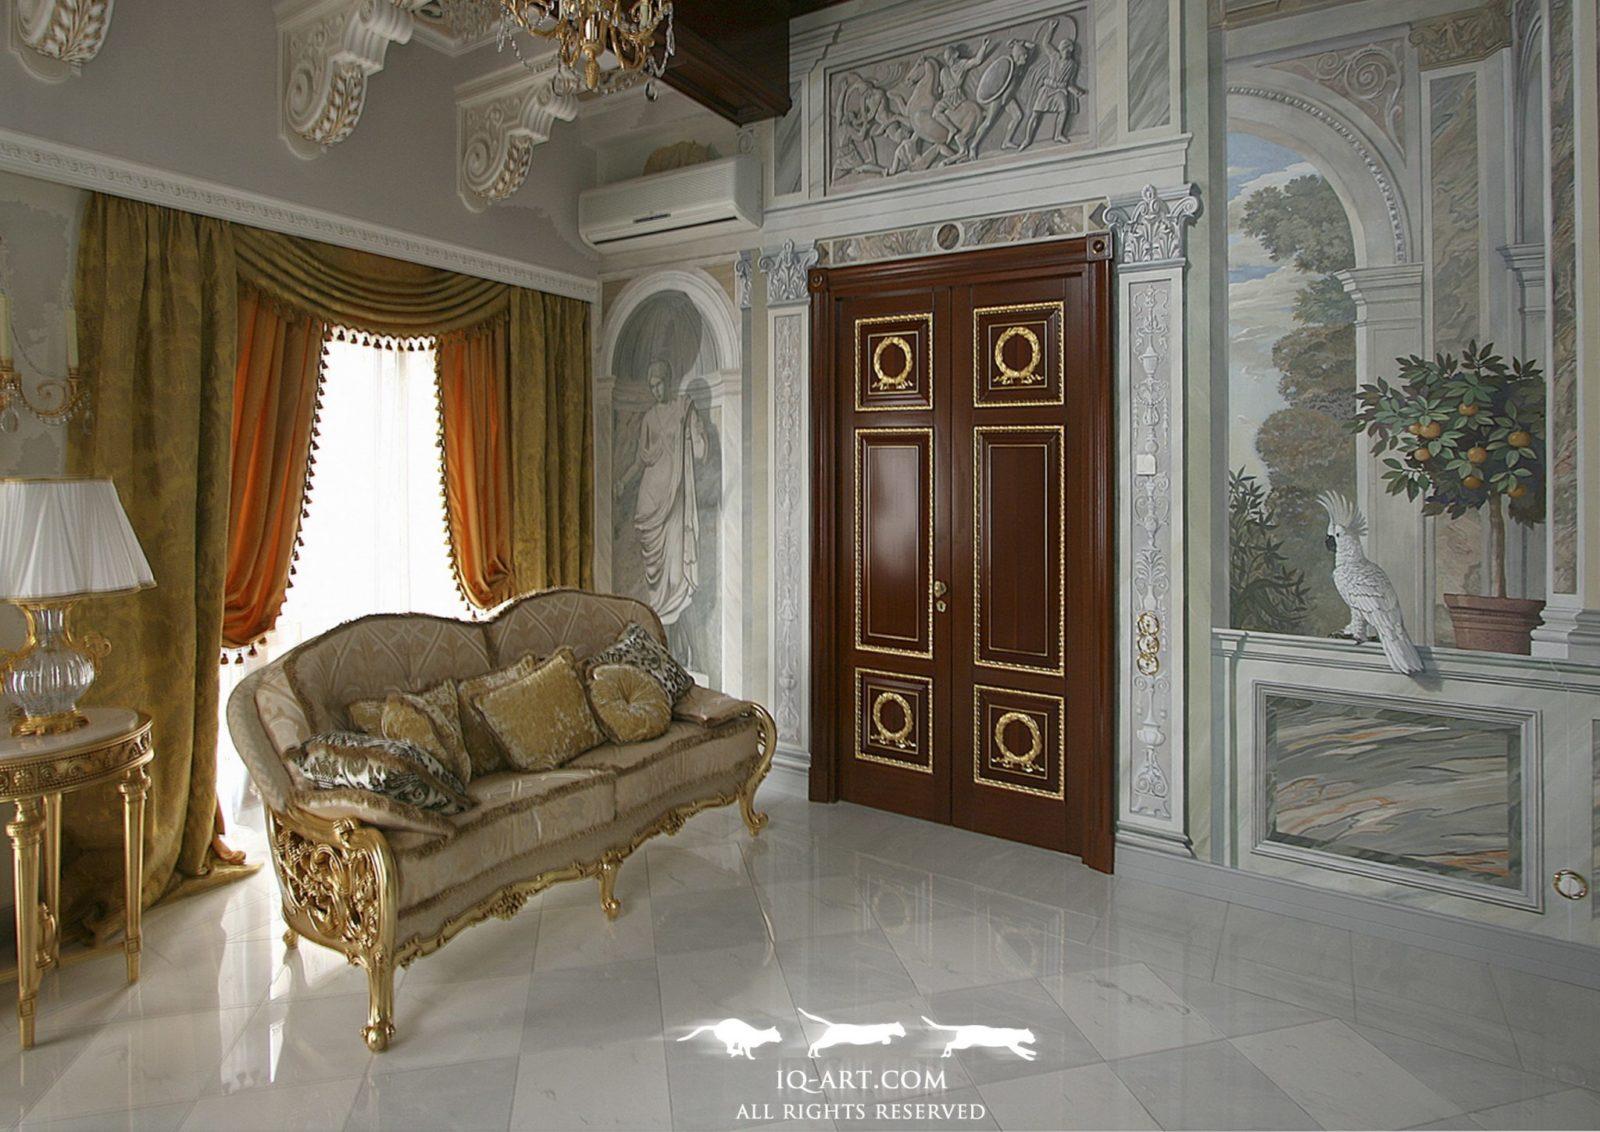 29 art interiors